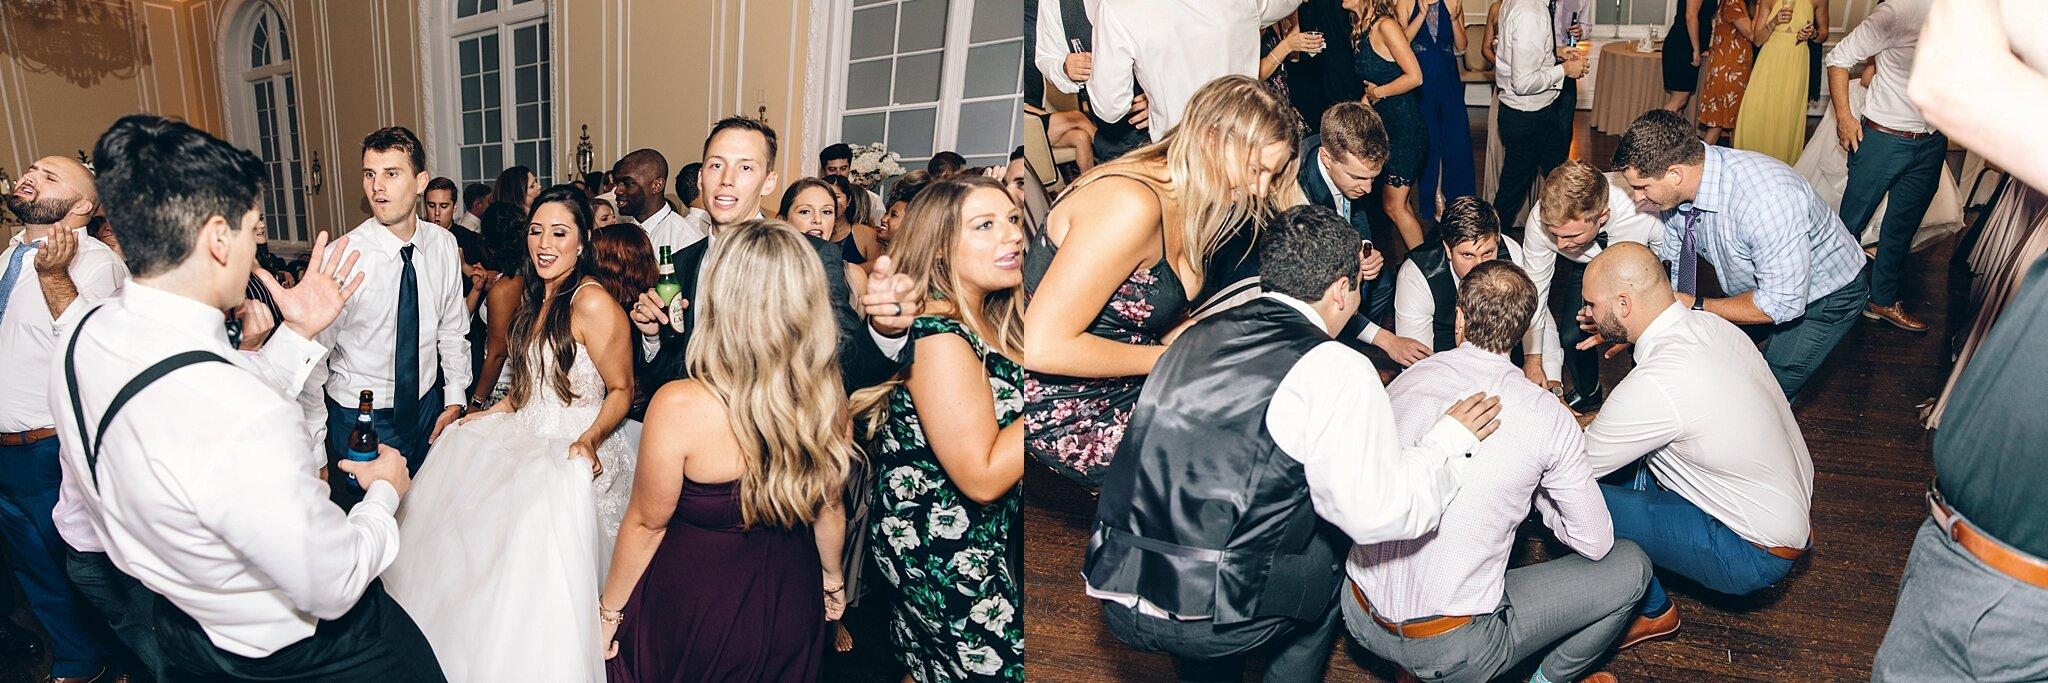 patrick-henry-ballroom-wedding-roanoke_0563.jpg